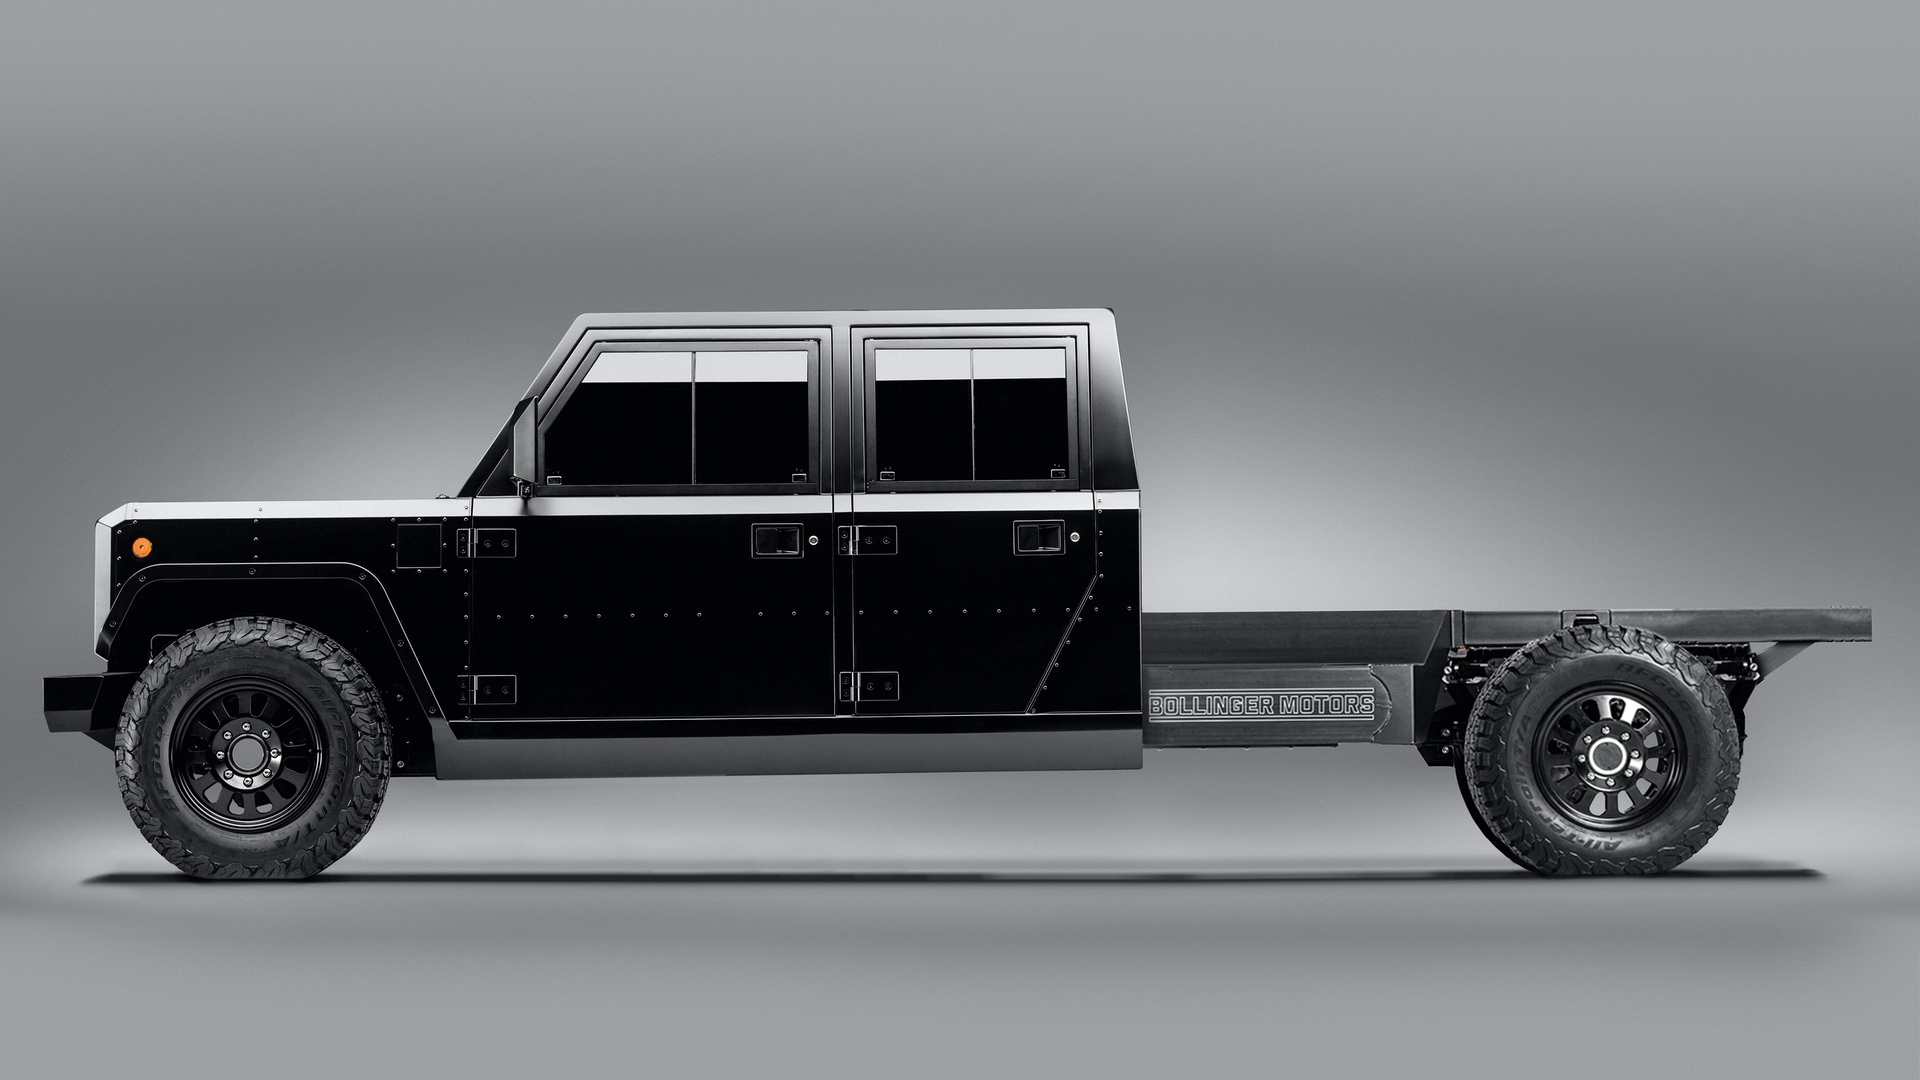 Bollinger-Motors-B2-Chassis-Cab-4-Door-side